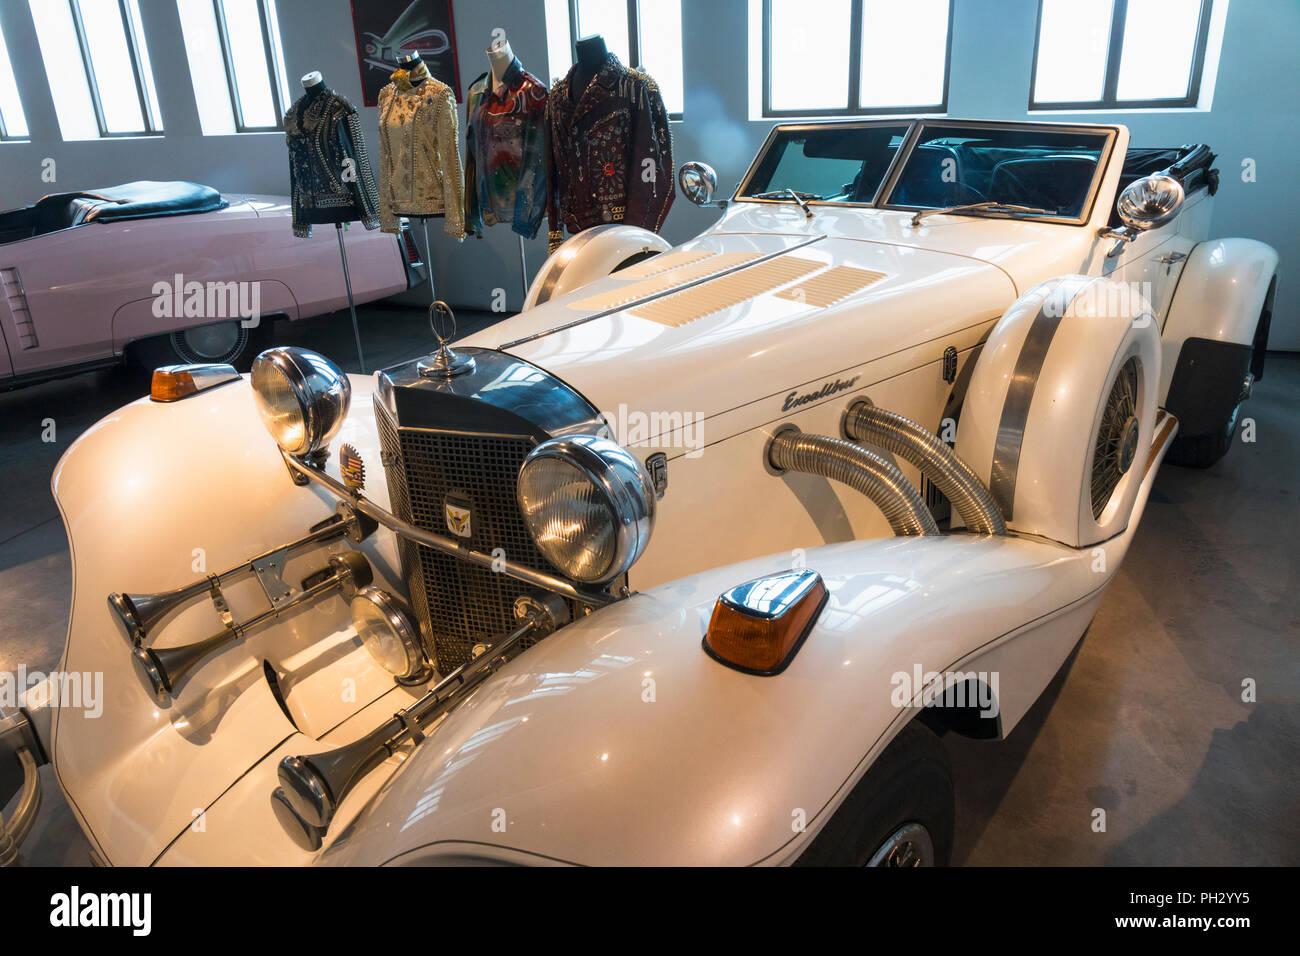 Museo Automovilistico y de la Moda, Malaga, Malaga Province, Spain.  Automobile and Fashion Museum.  The limited edition V8, 155 HP, 5000 cc, Model IV - Stock Image